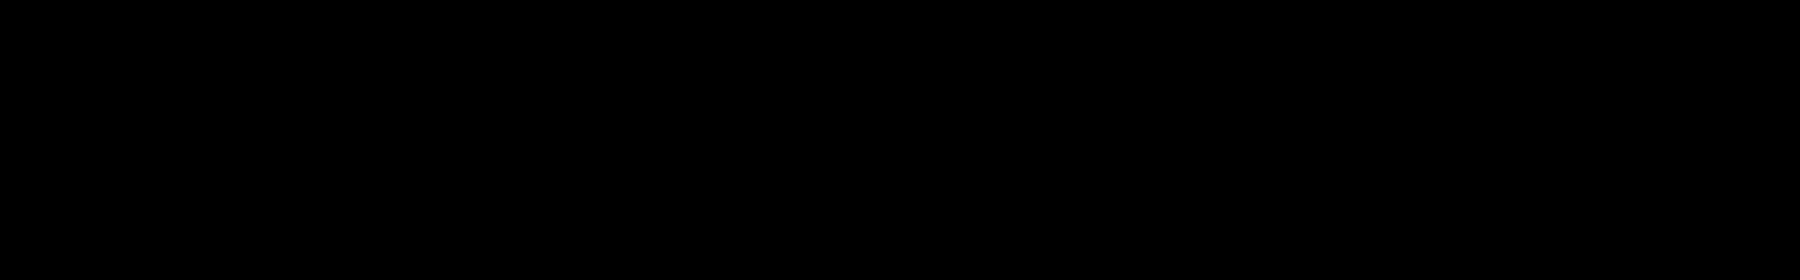 Chemical Techno audio waveform